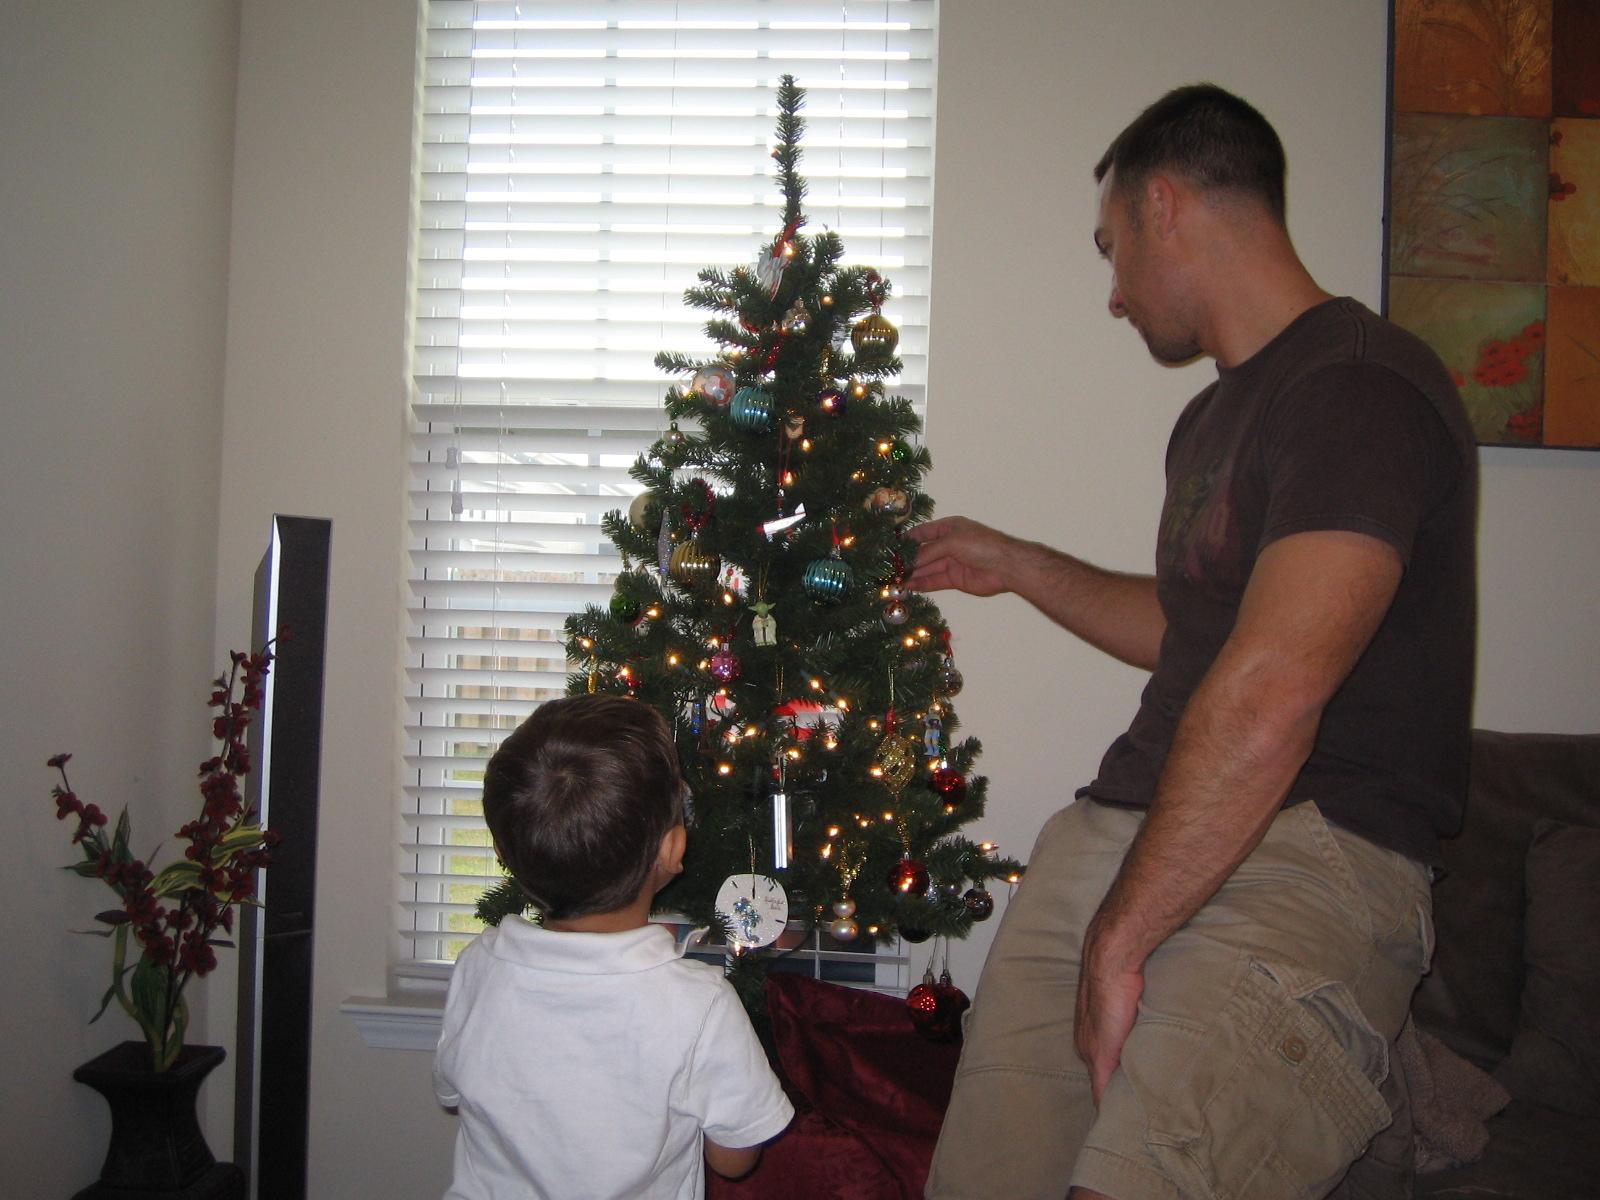 christmas in november - Small Christmas Tree With Lights